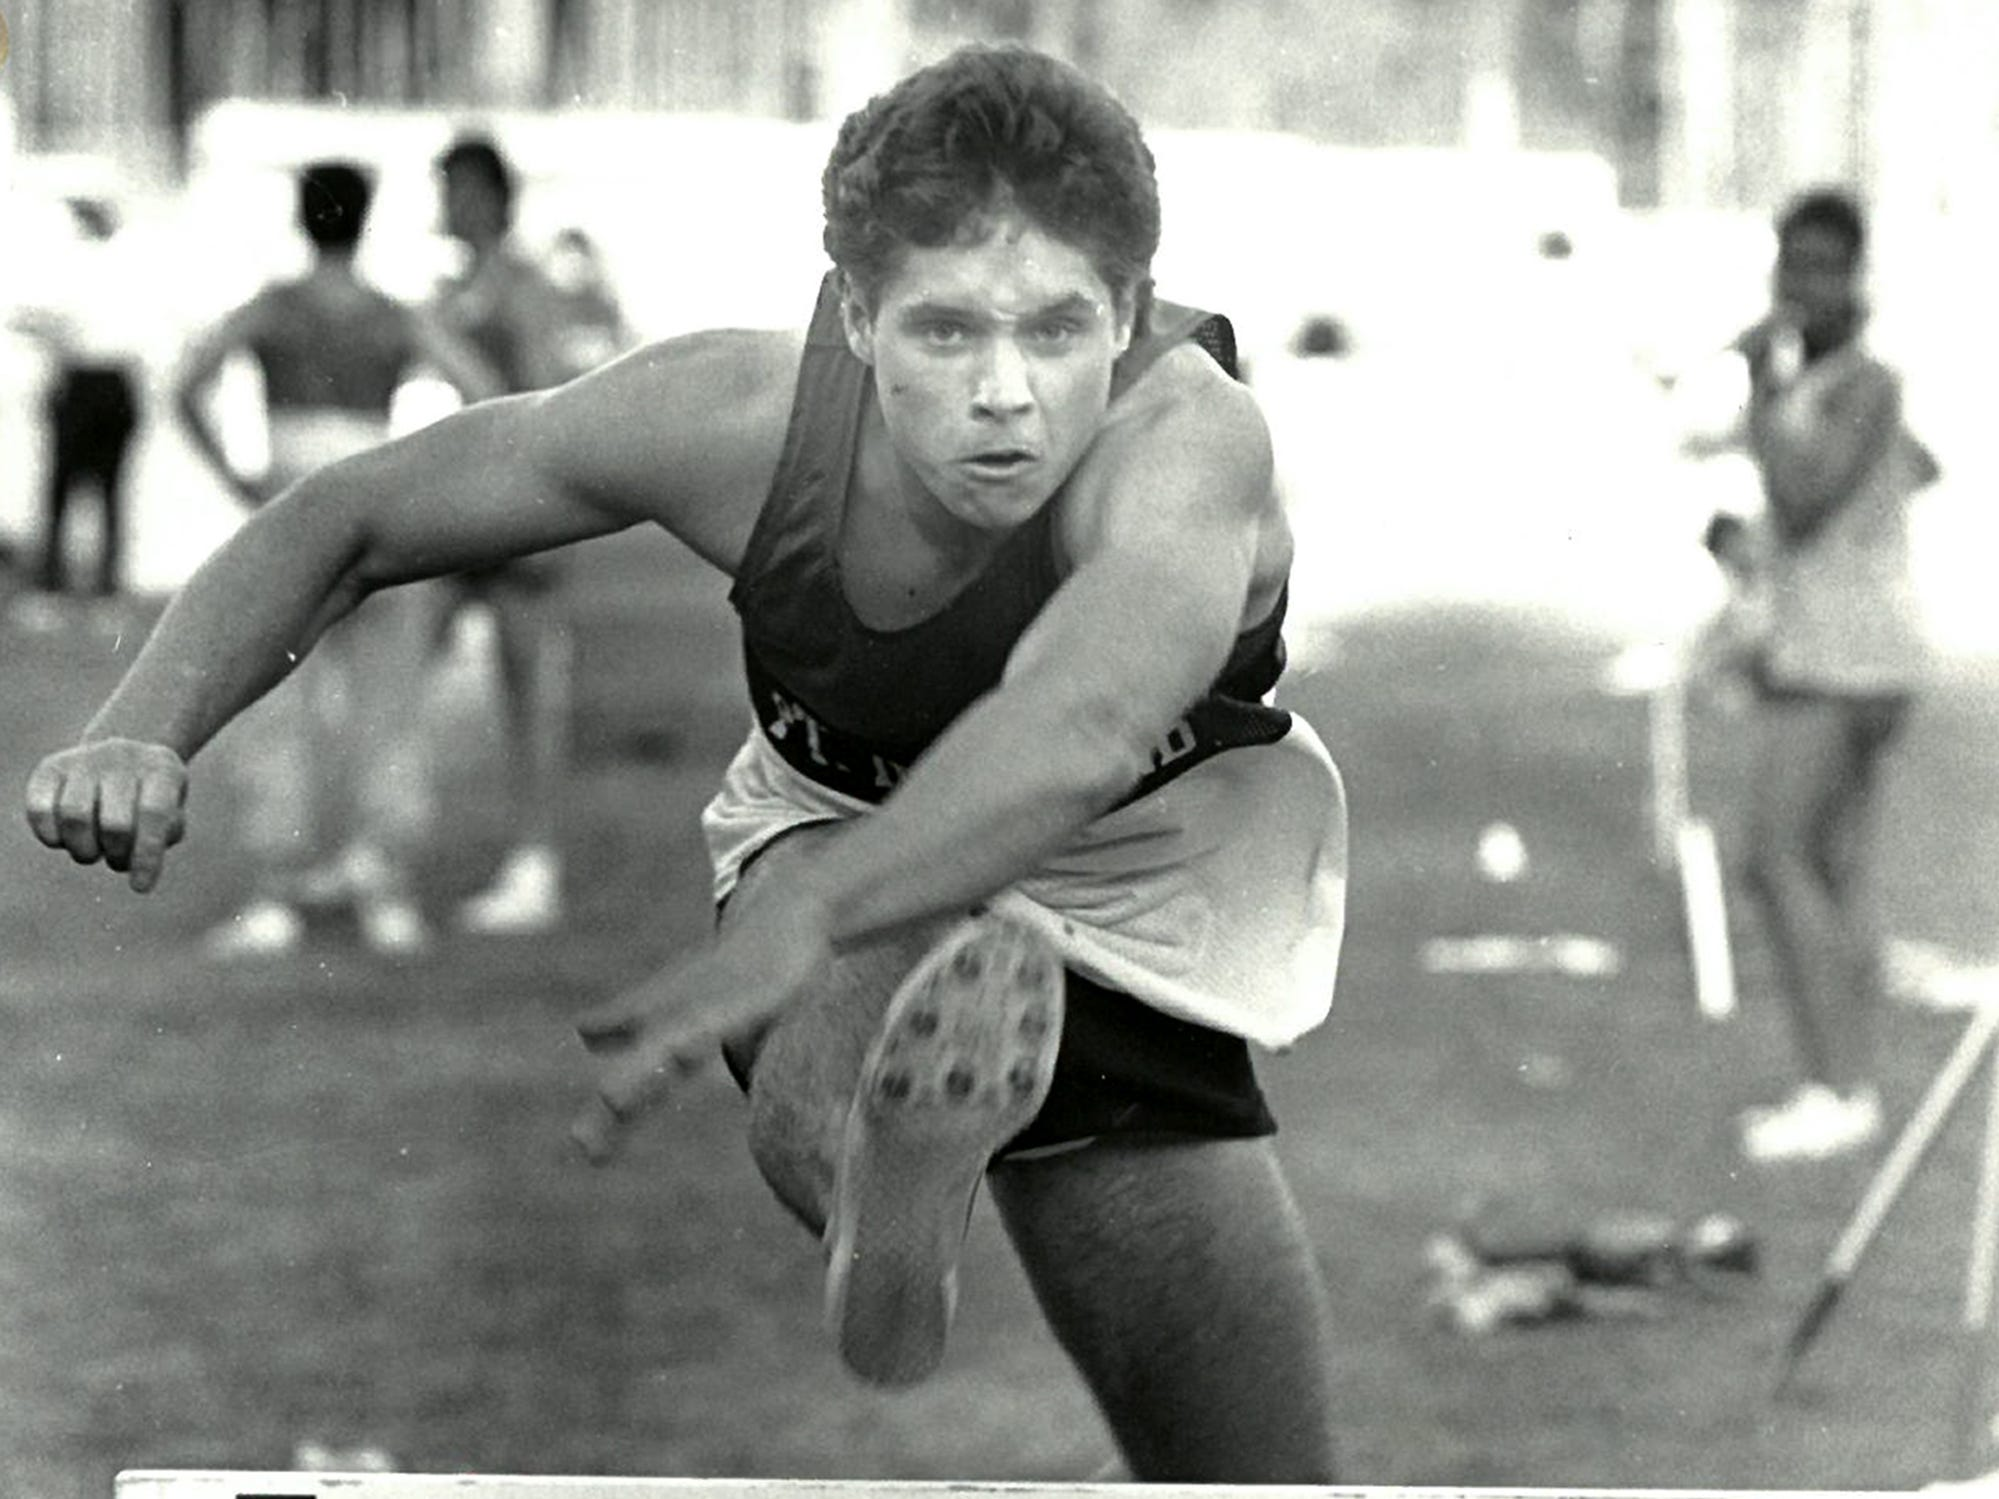 05/24/88PT Nick Corn Hurdles